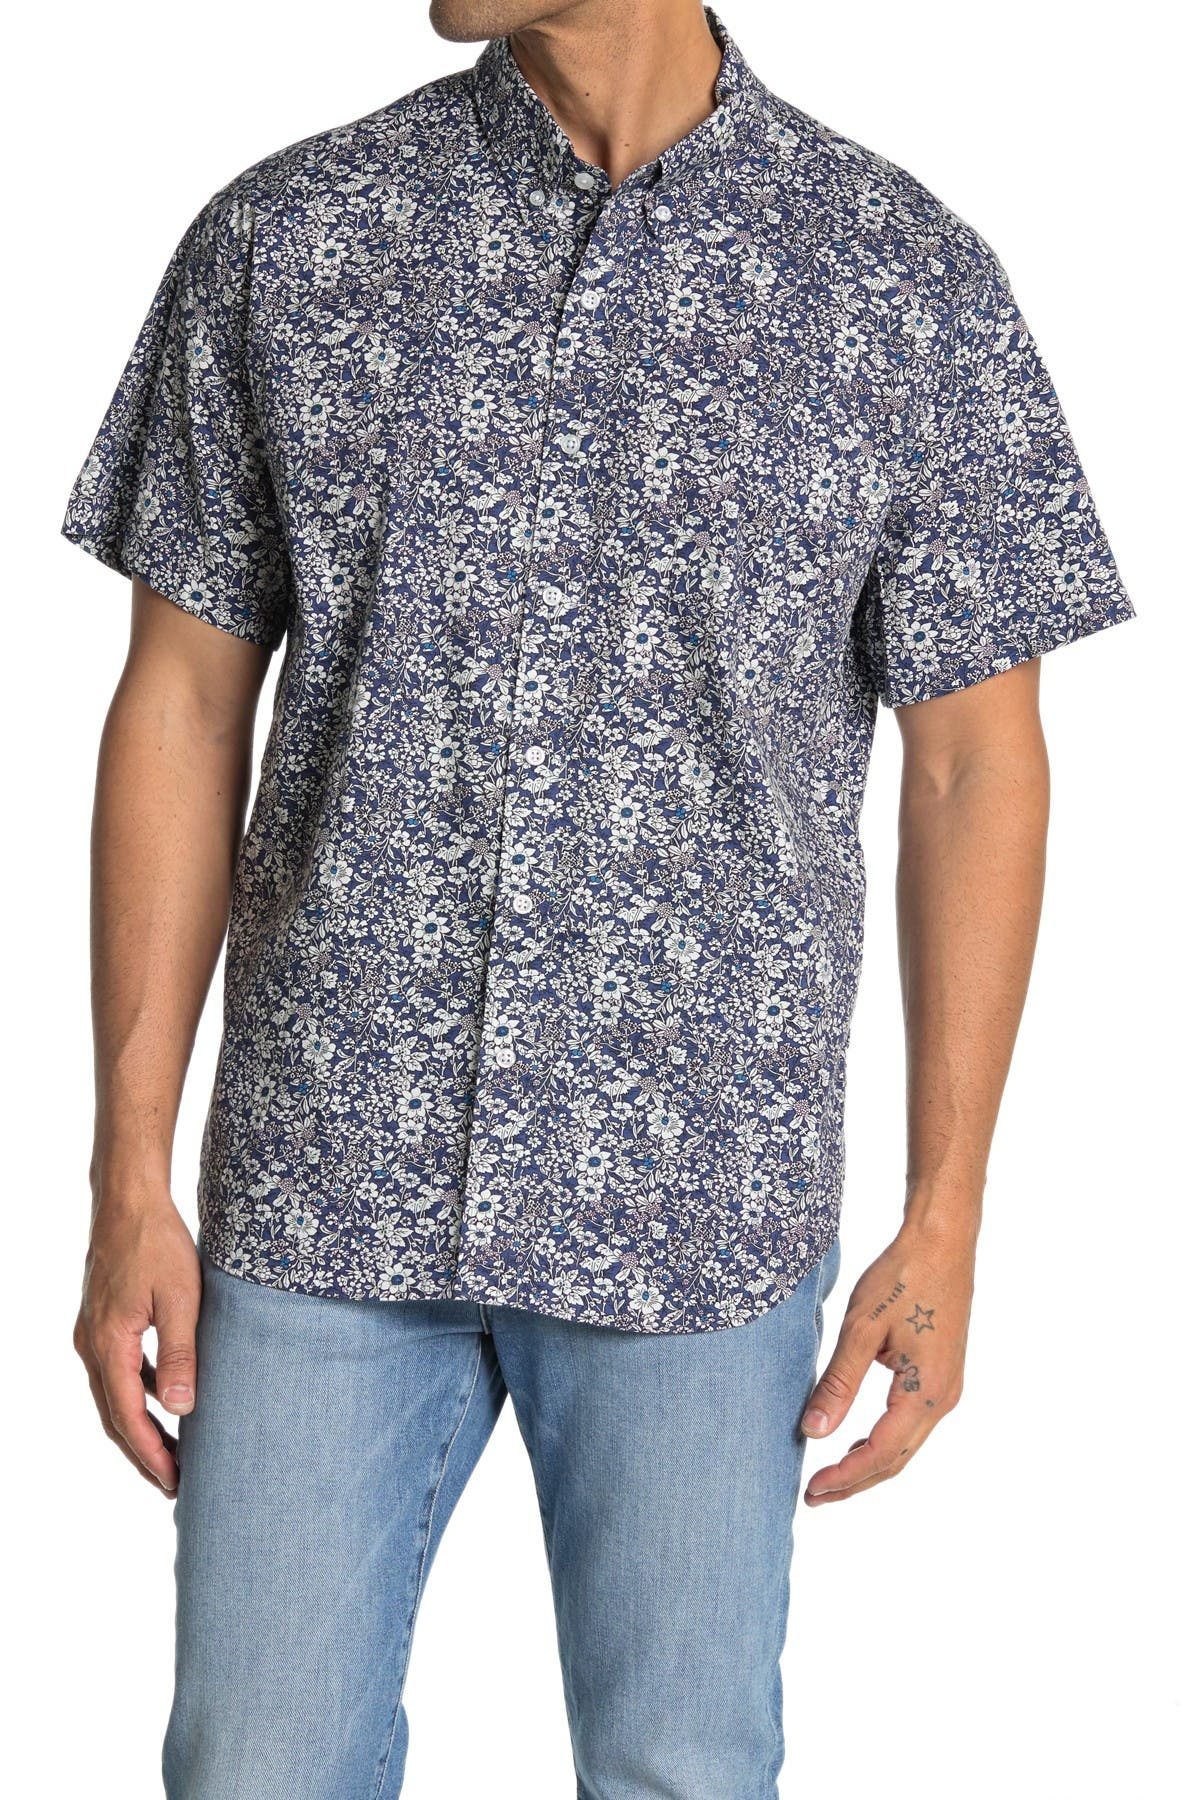 Image of J. Crew Floral Printed Short Sleeve Shirt